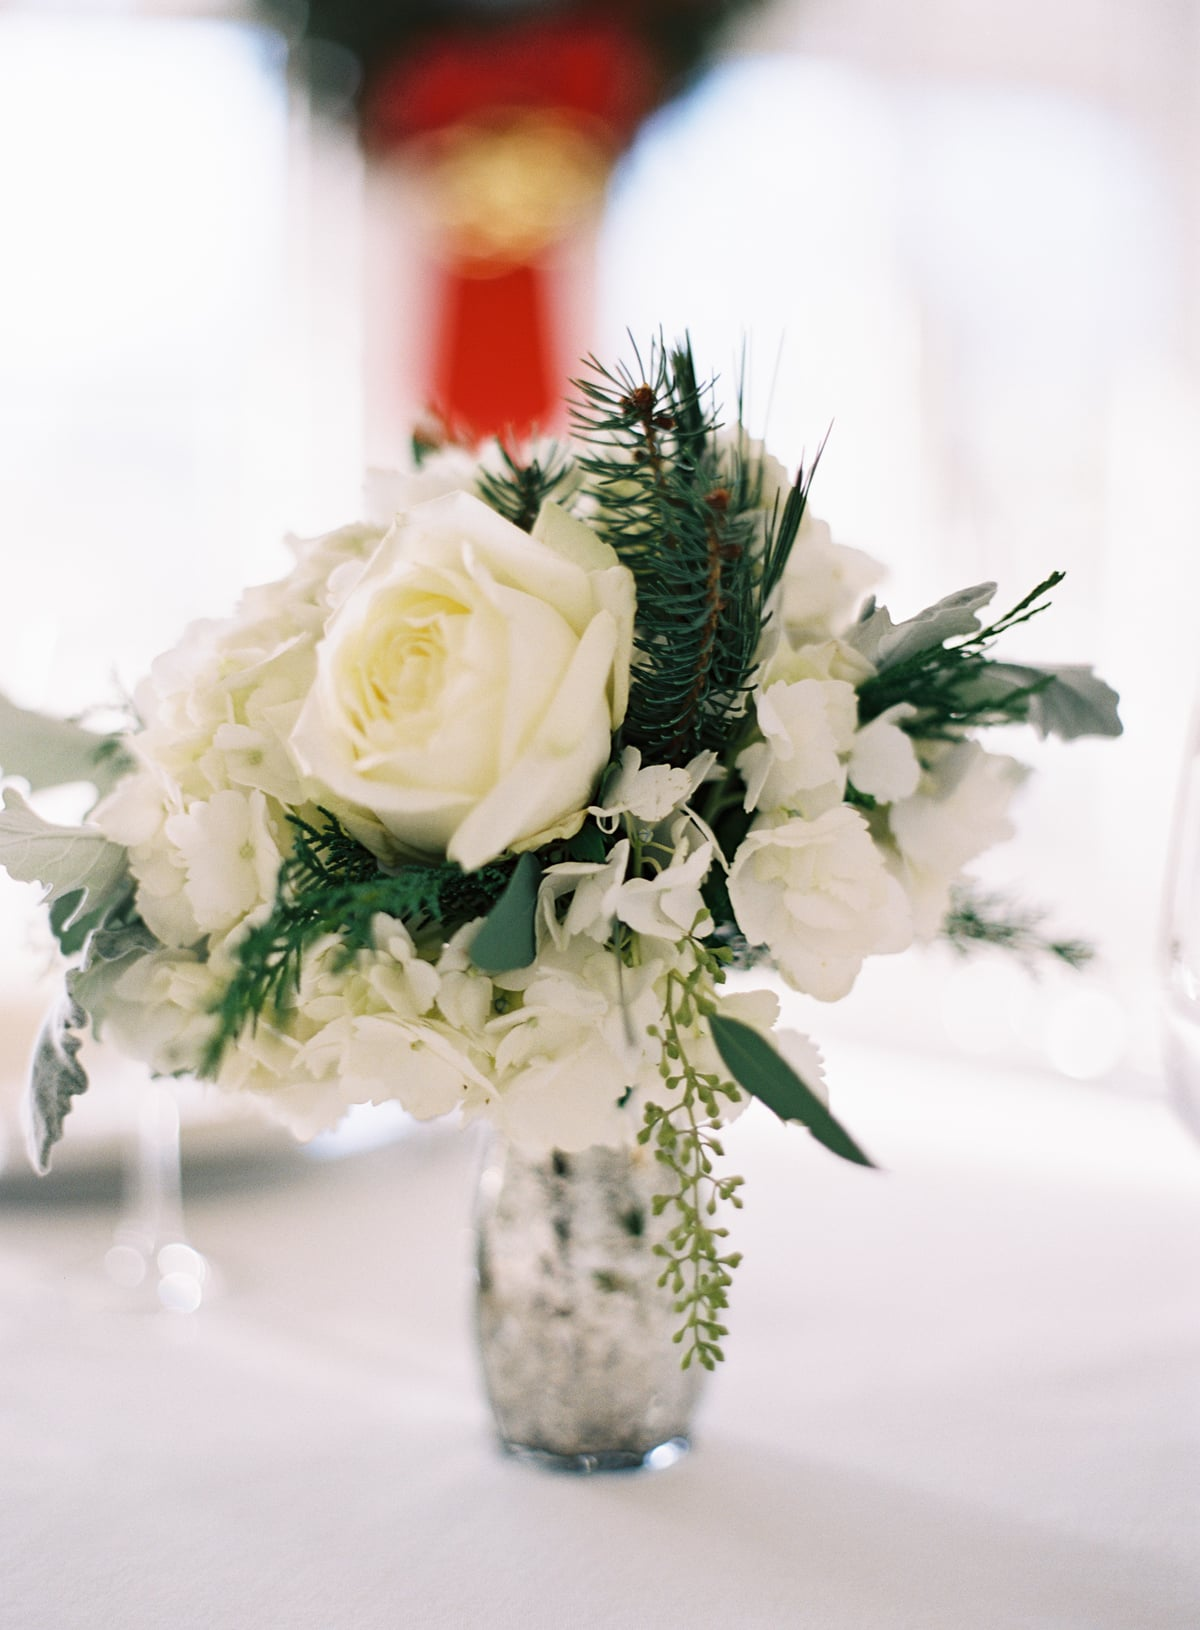 clifton-inn-wedding-049.jpg